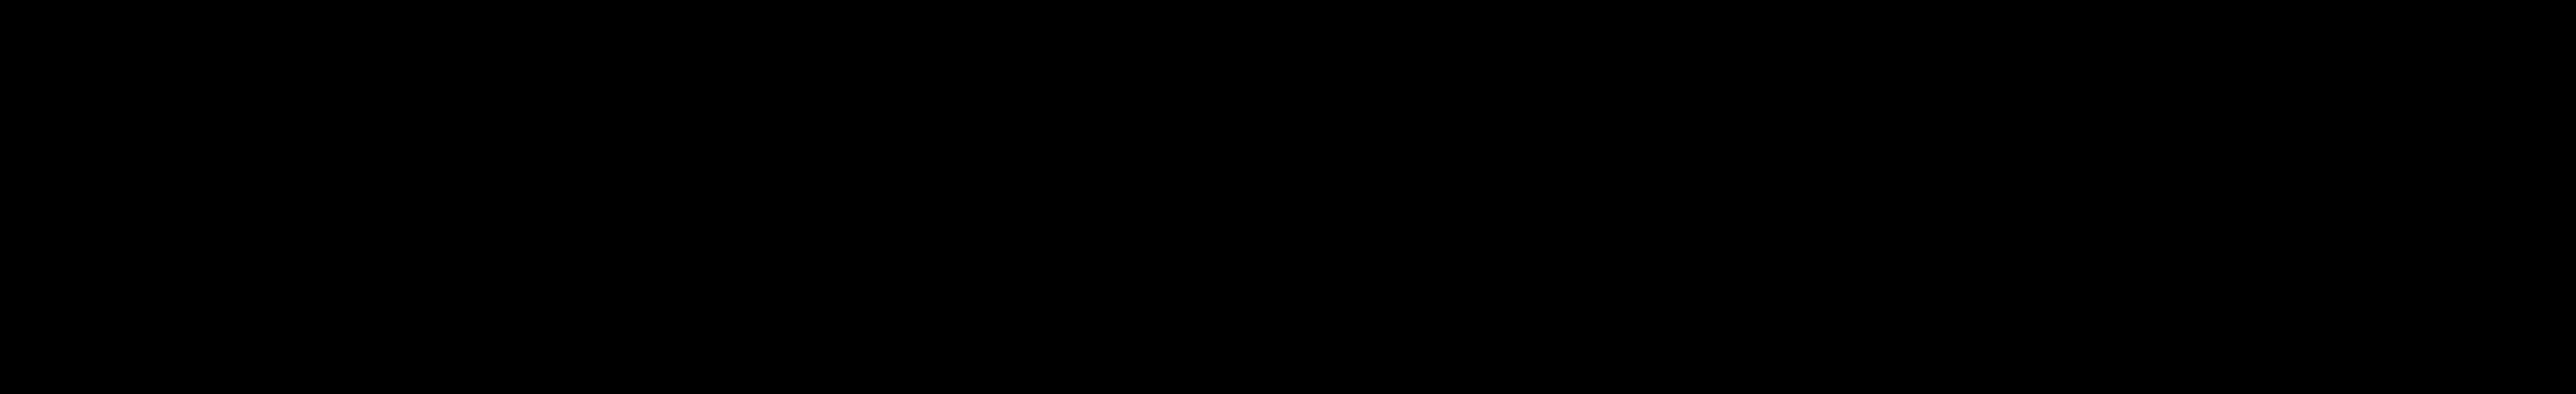 Mary_Kay_logo_black.png